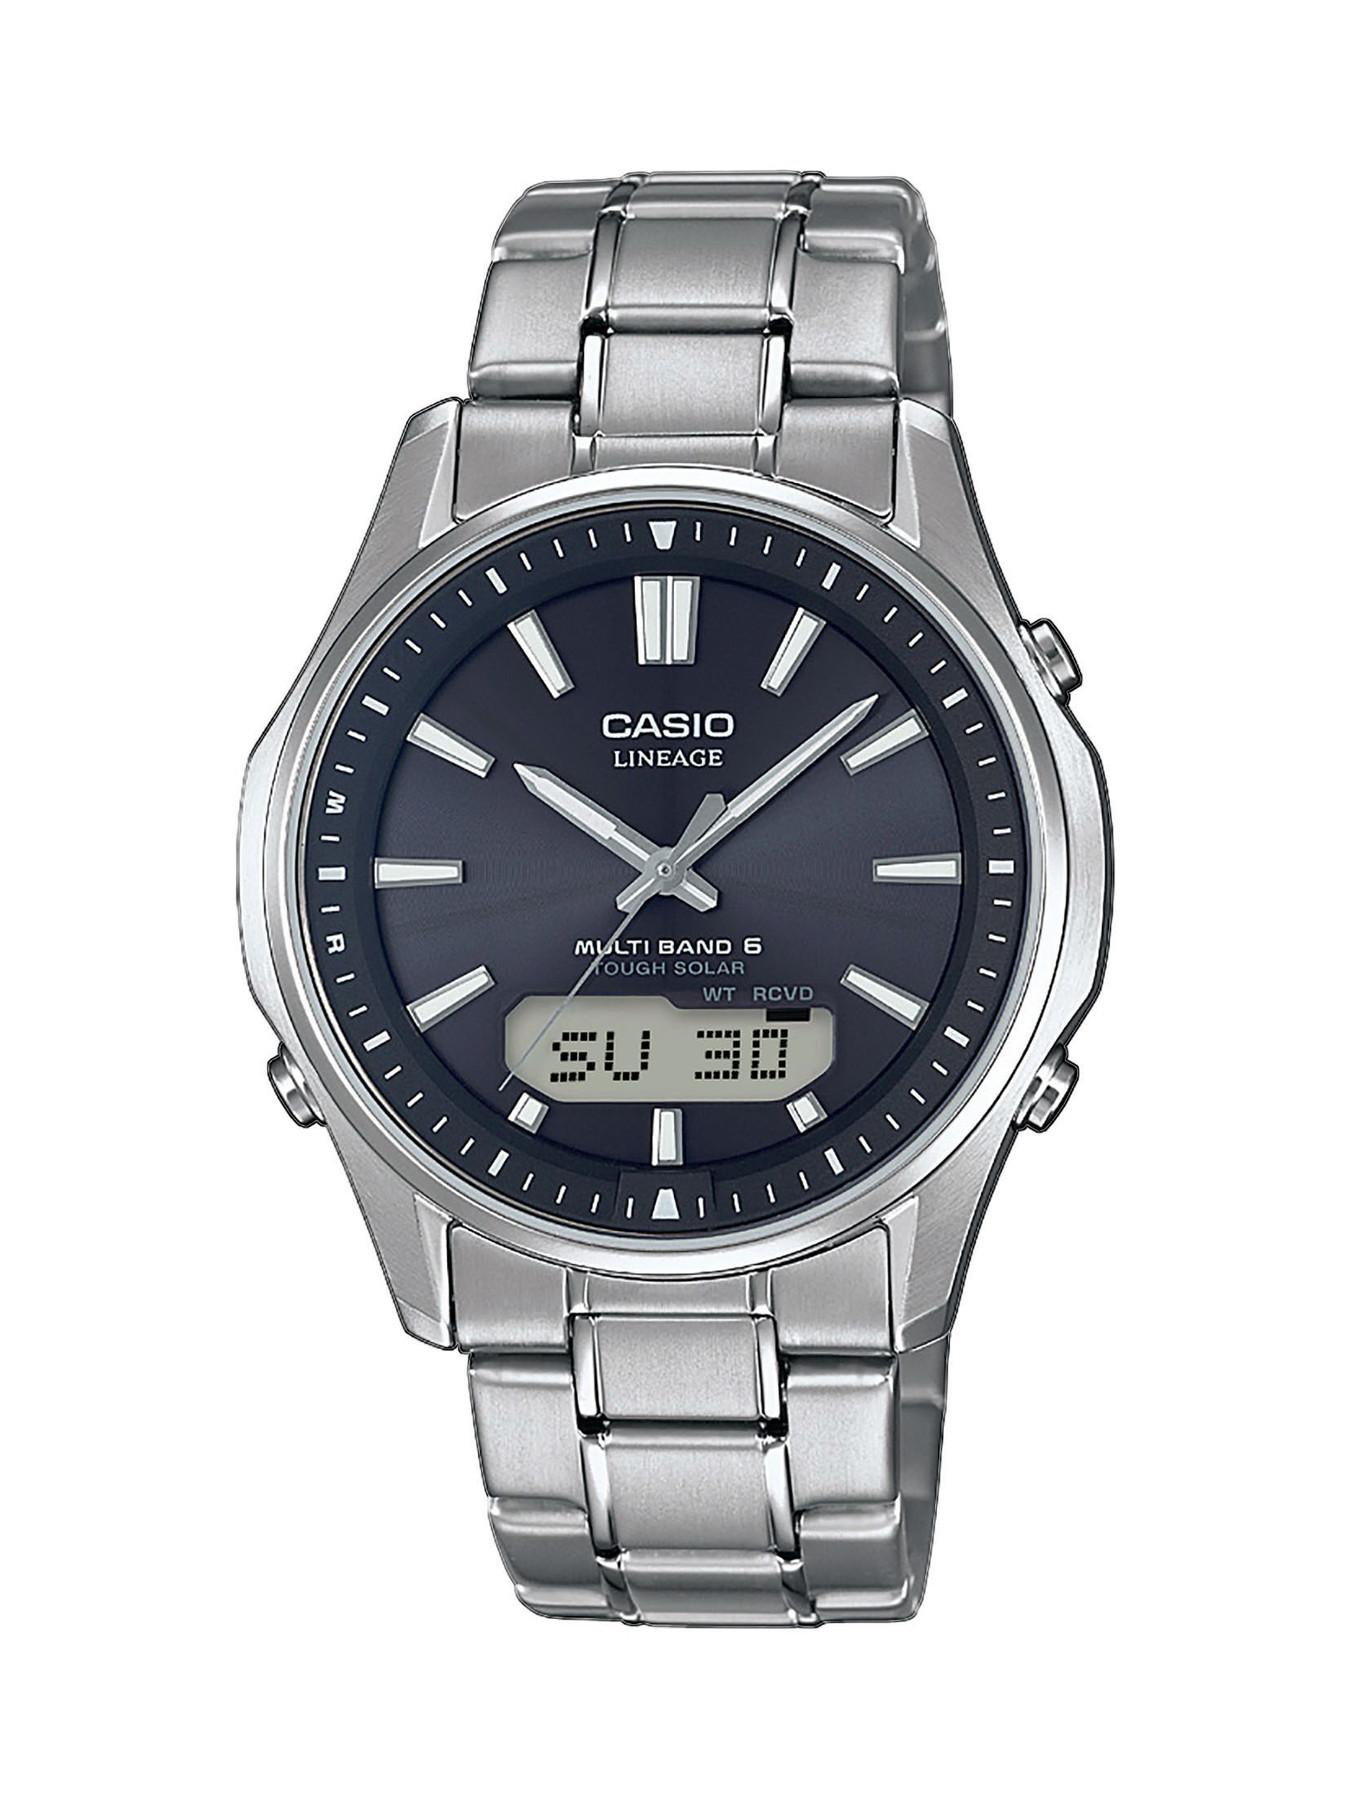 Casio Funkuhr Solar Lineage LCW-M100TSE-1AER